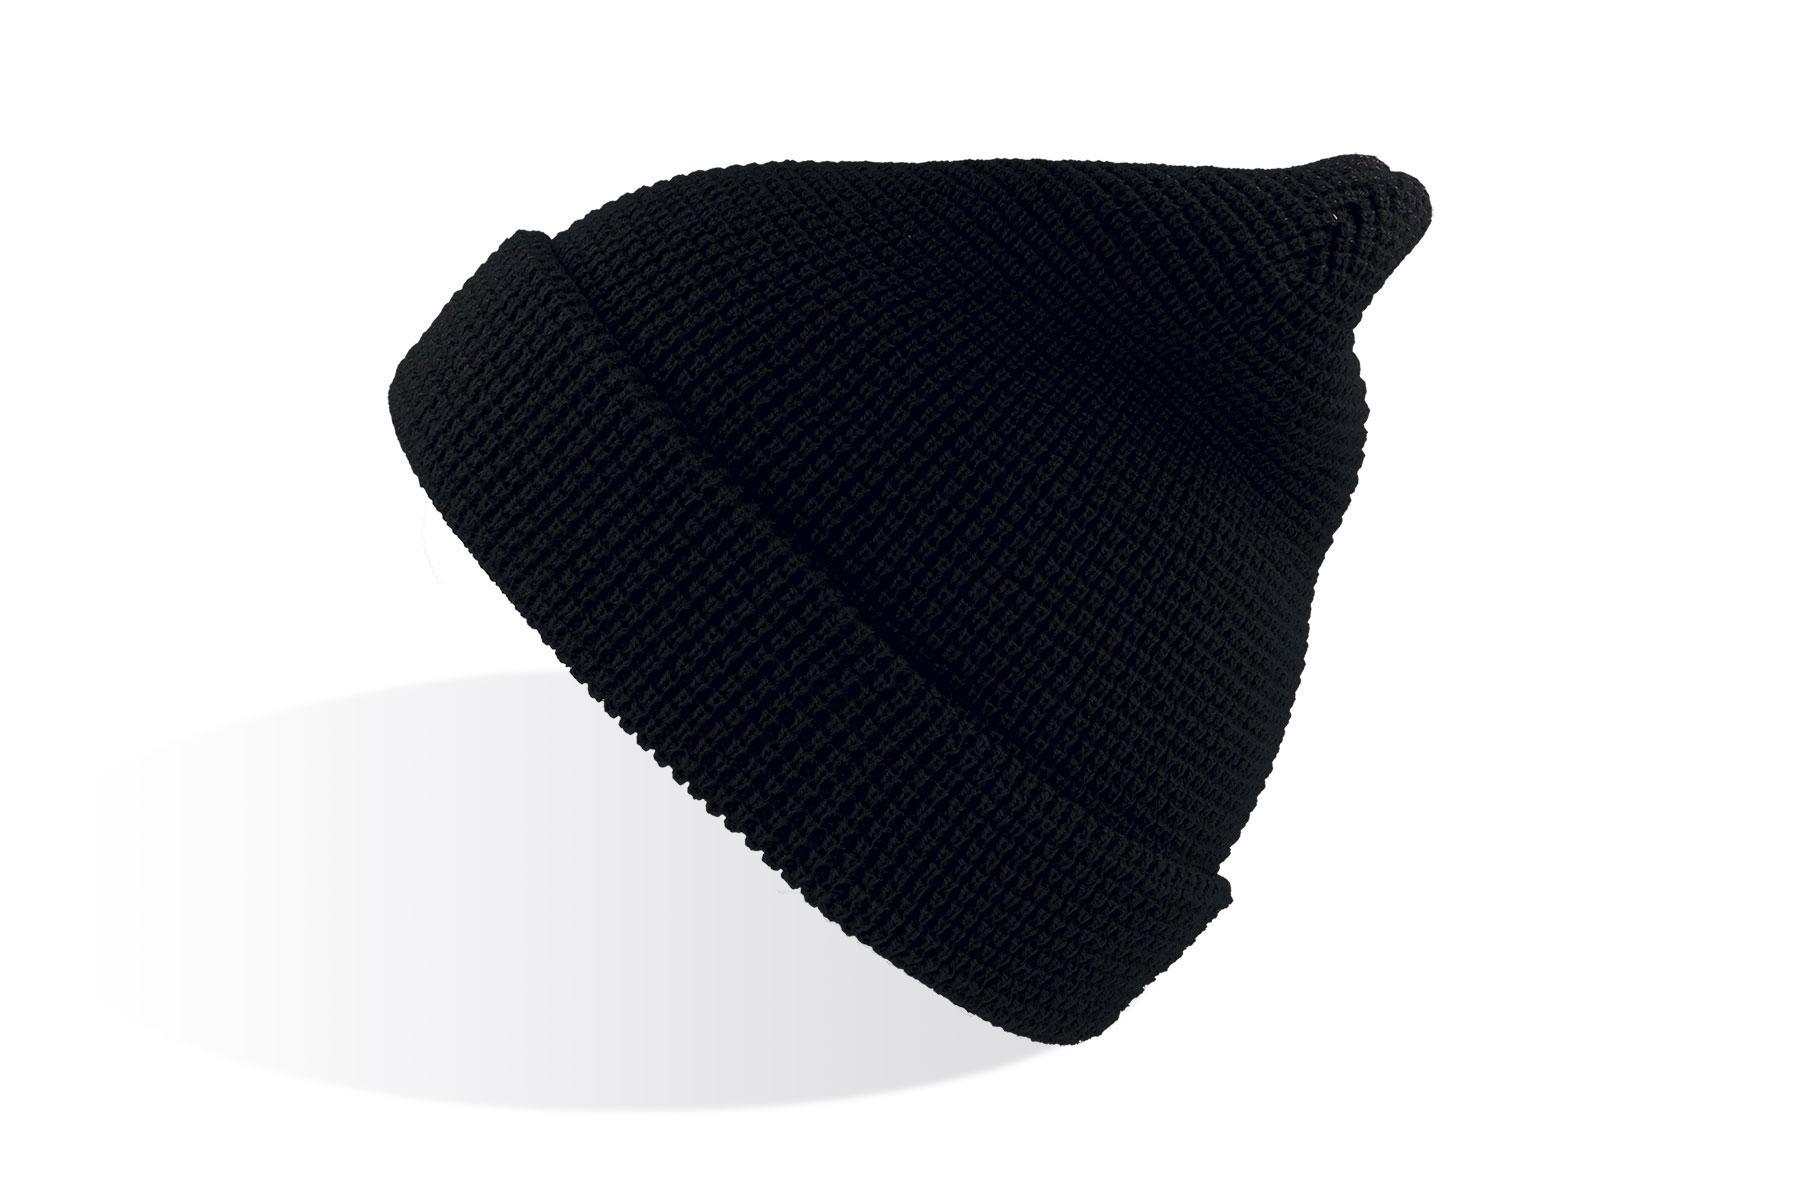 Blog pipo - NEW 2019 ATLANTIS CAPS & HATS - BLOG - 2